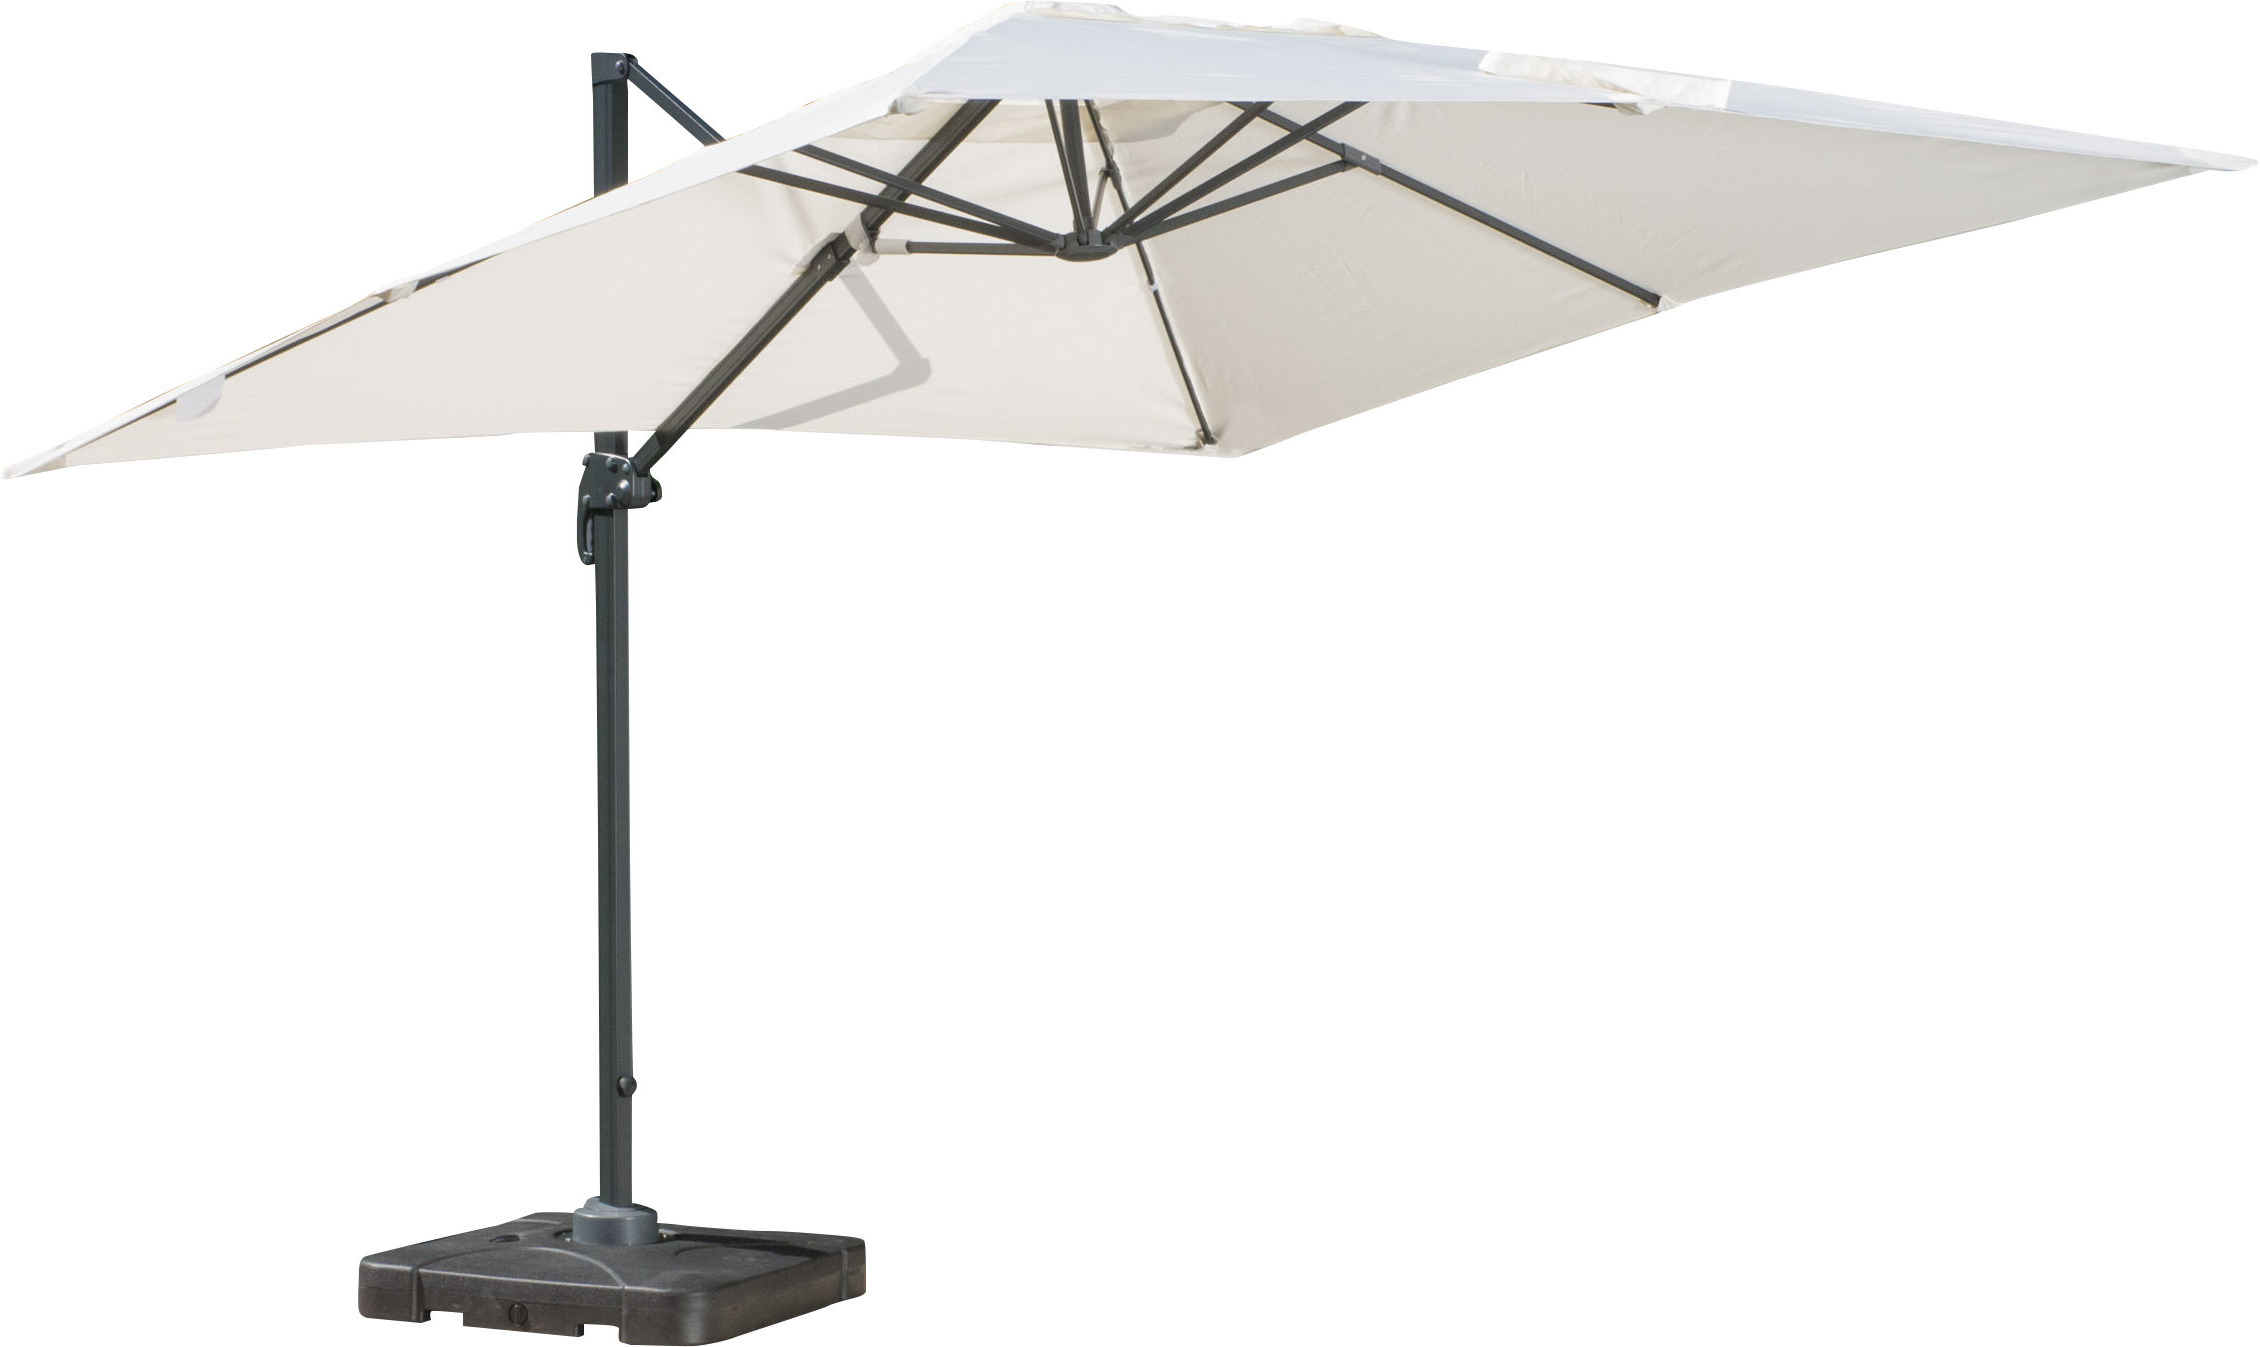 Sol 72 Outdoor Boracay 10' Square Cantilever Umbrella Throughout Latest Krystal Square Cantilever Sunbrella Umbrellas (View 2 of 20)